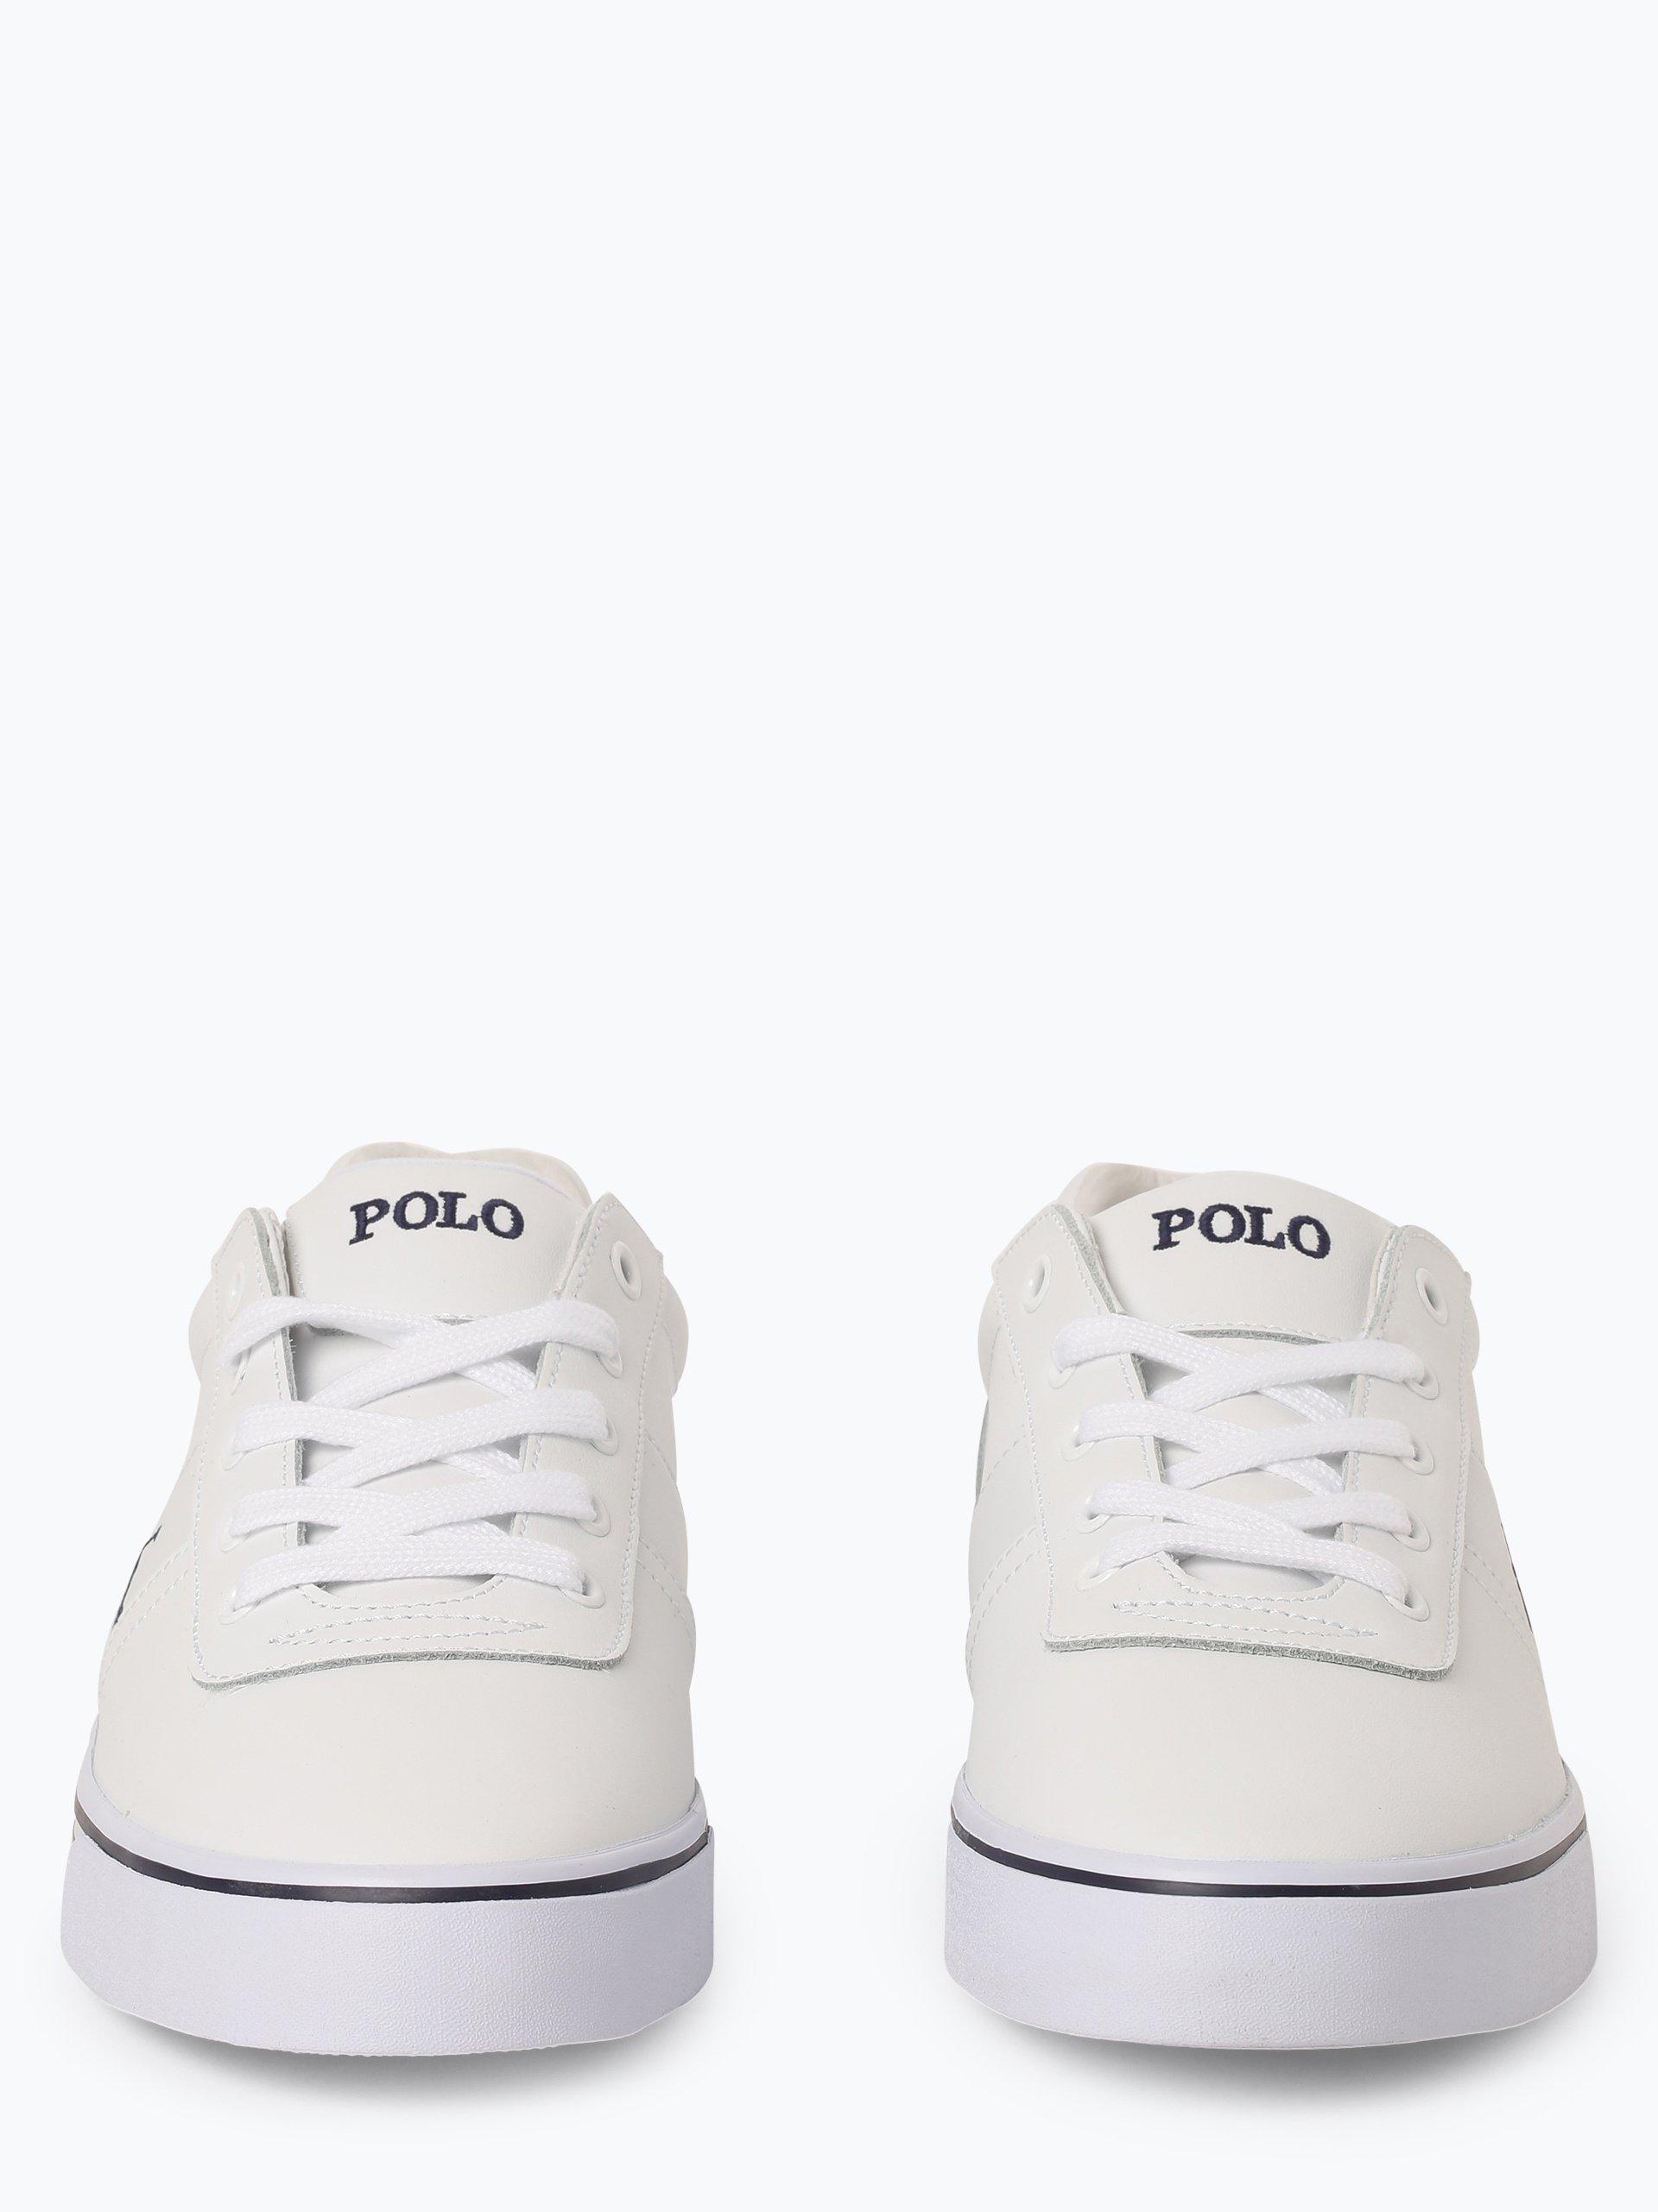 Polo Ralph Lauren Herren Sneaker mit Leder-Anteil